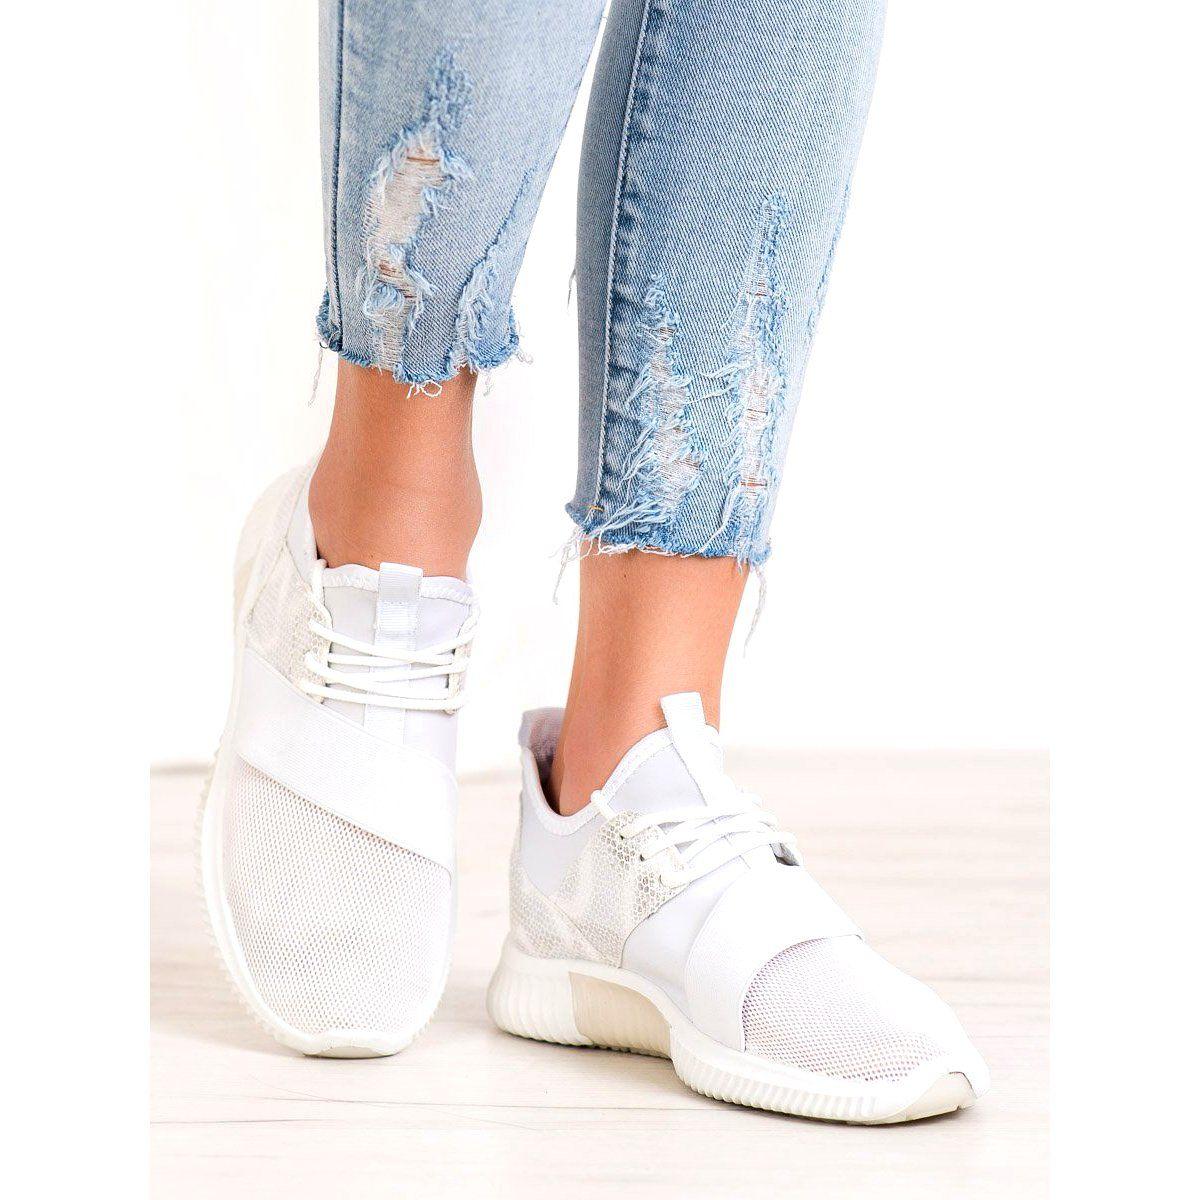 Shelovet Buty Sportowe Z Gumka Biale Adidas Tubular Adidas Sneakers Sneakers